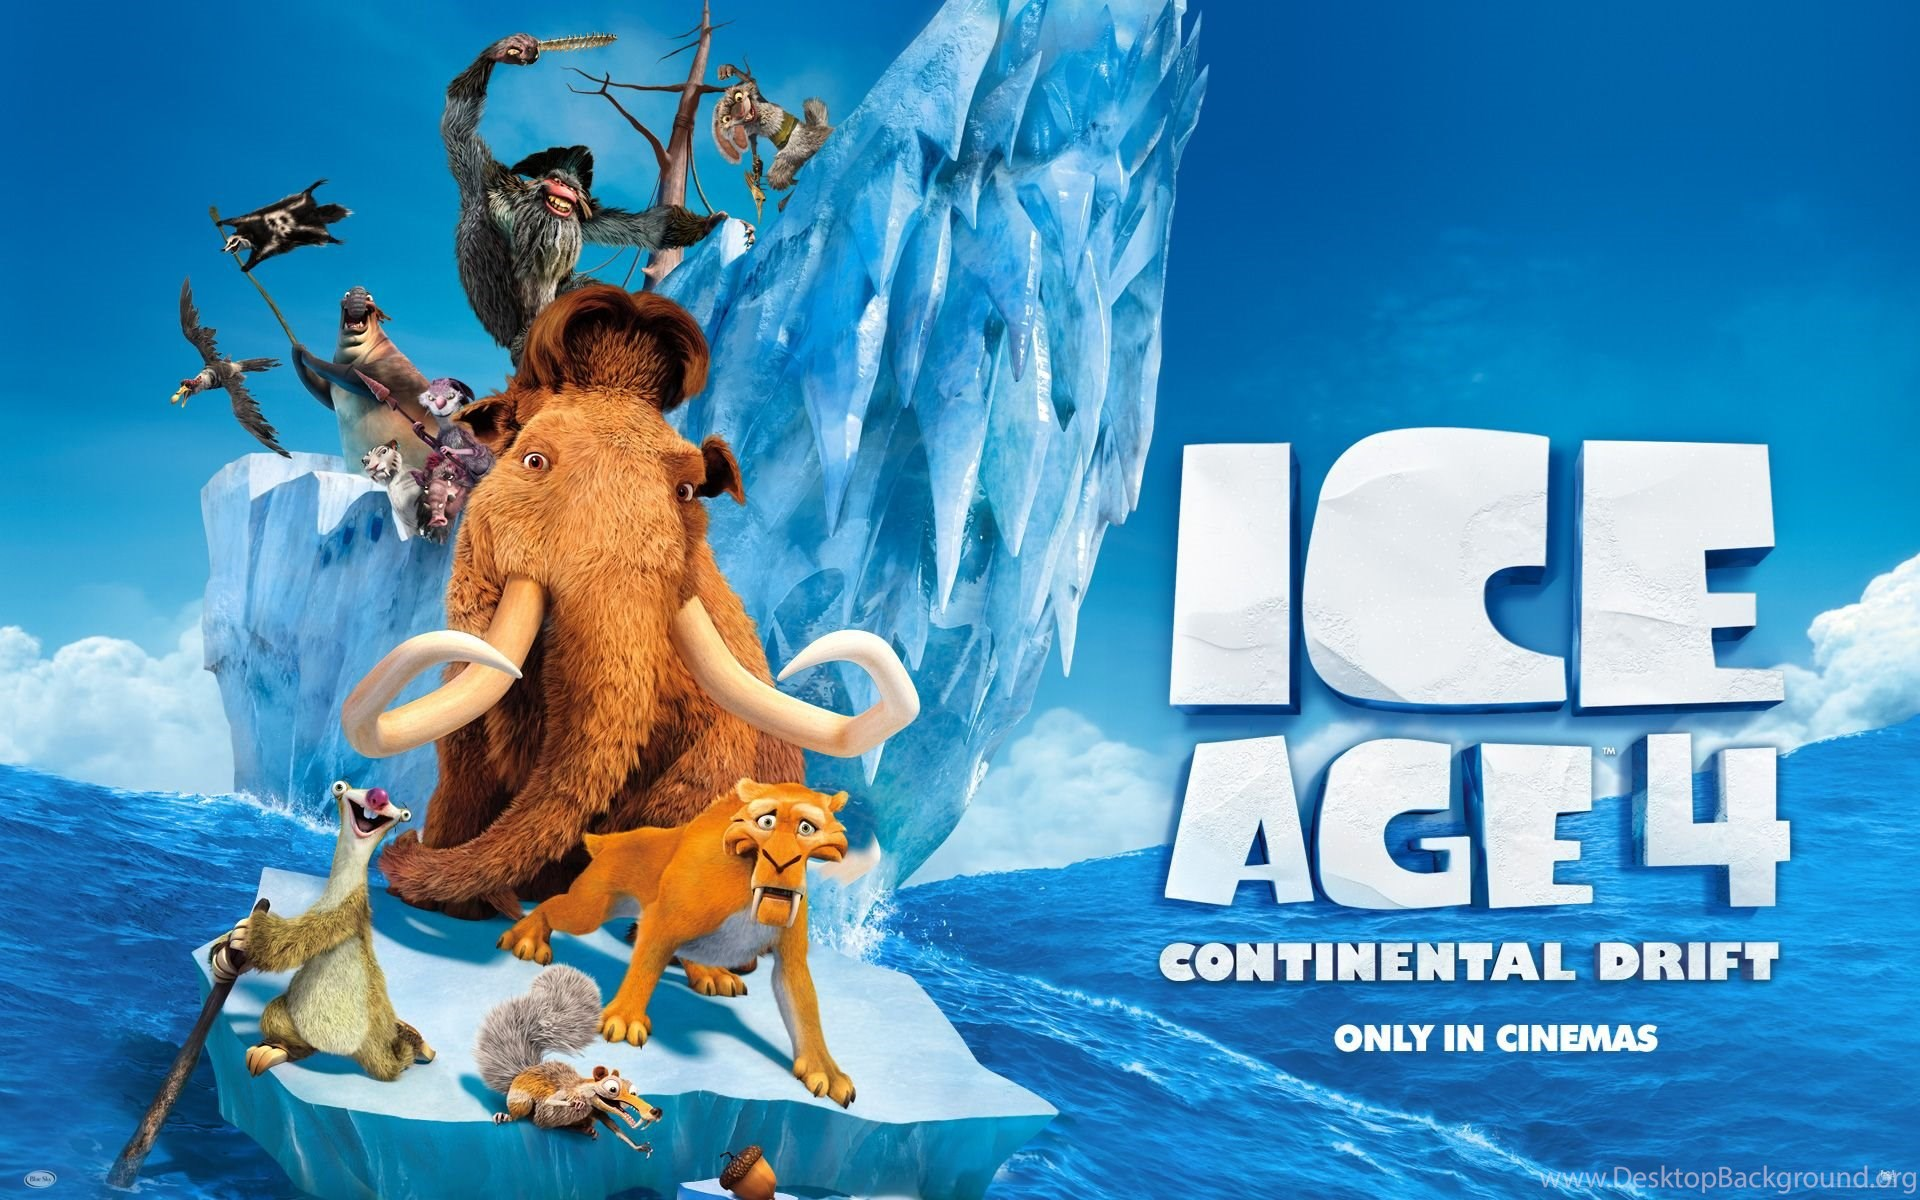 1920x1200px ice age 4 continental drift desktop background